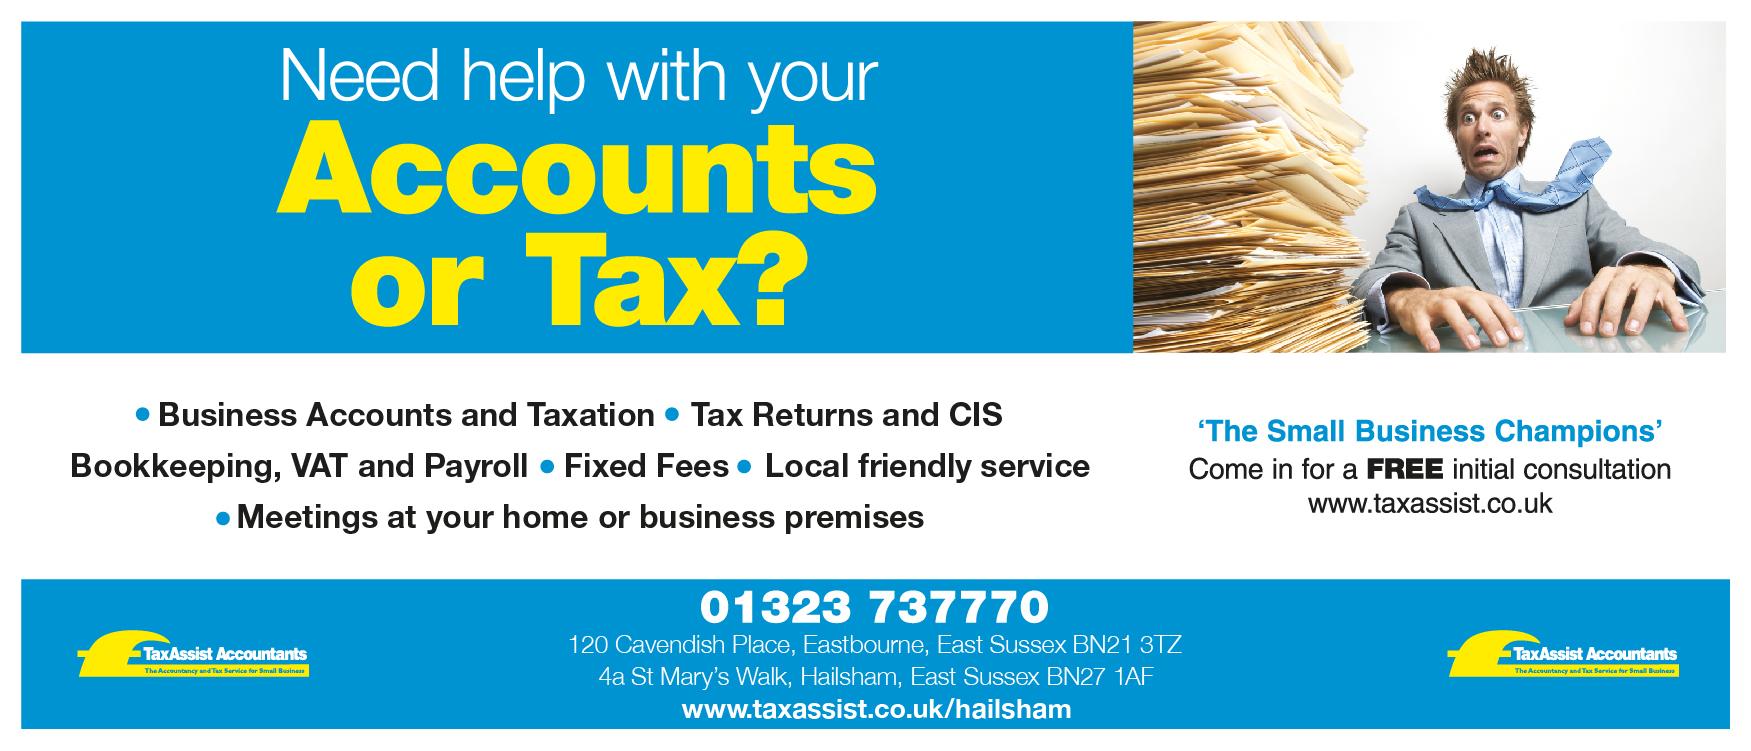 Tax Assist Accountants